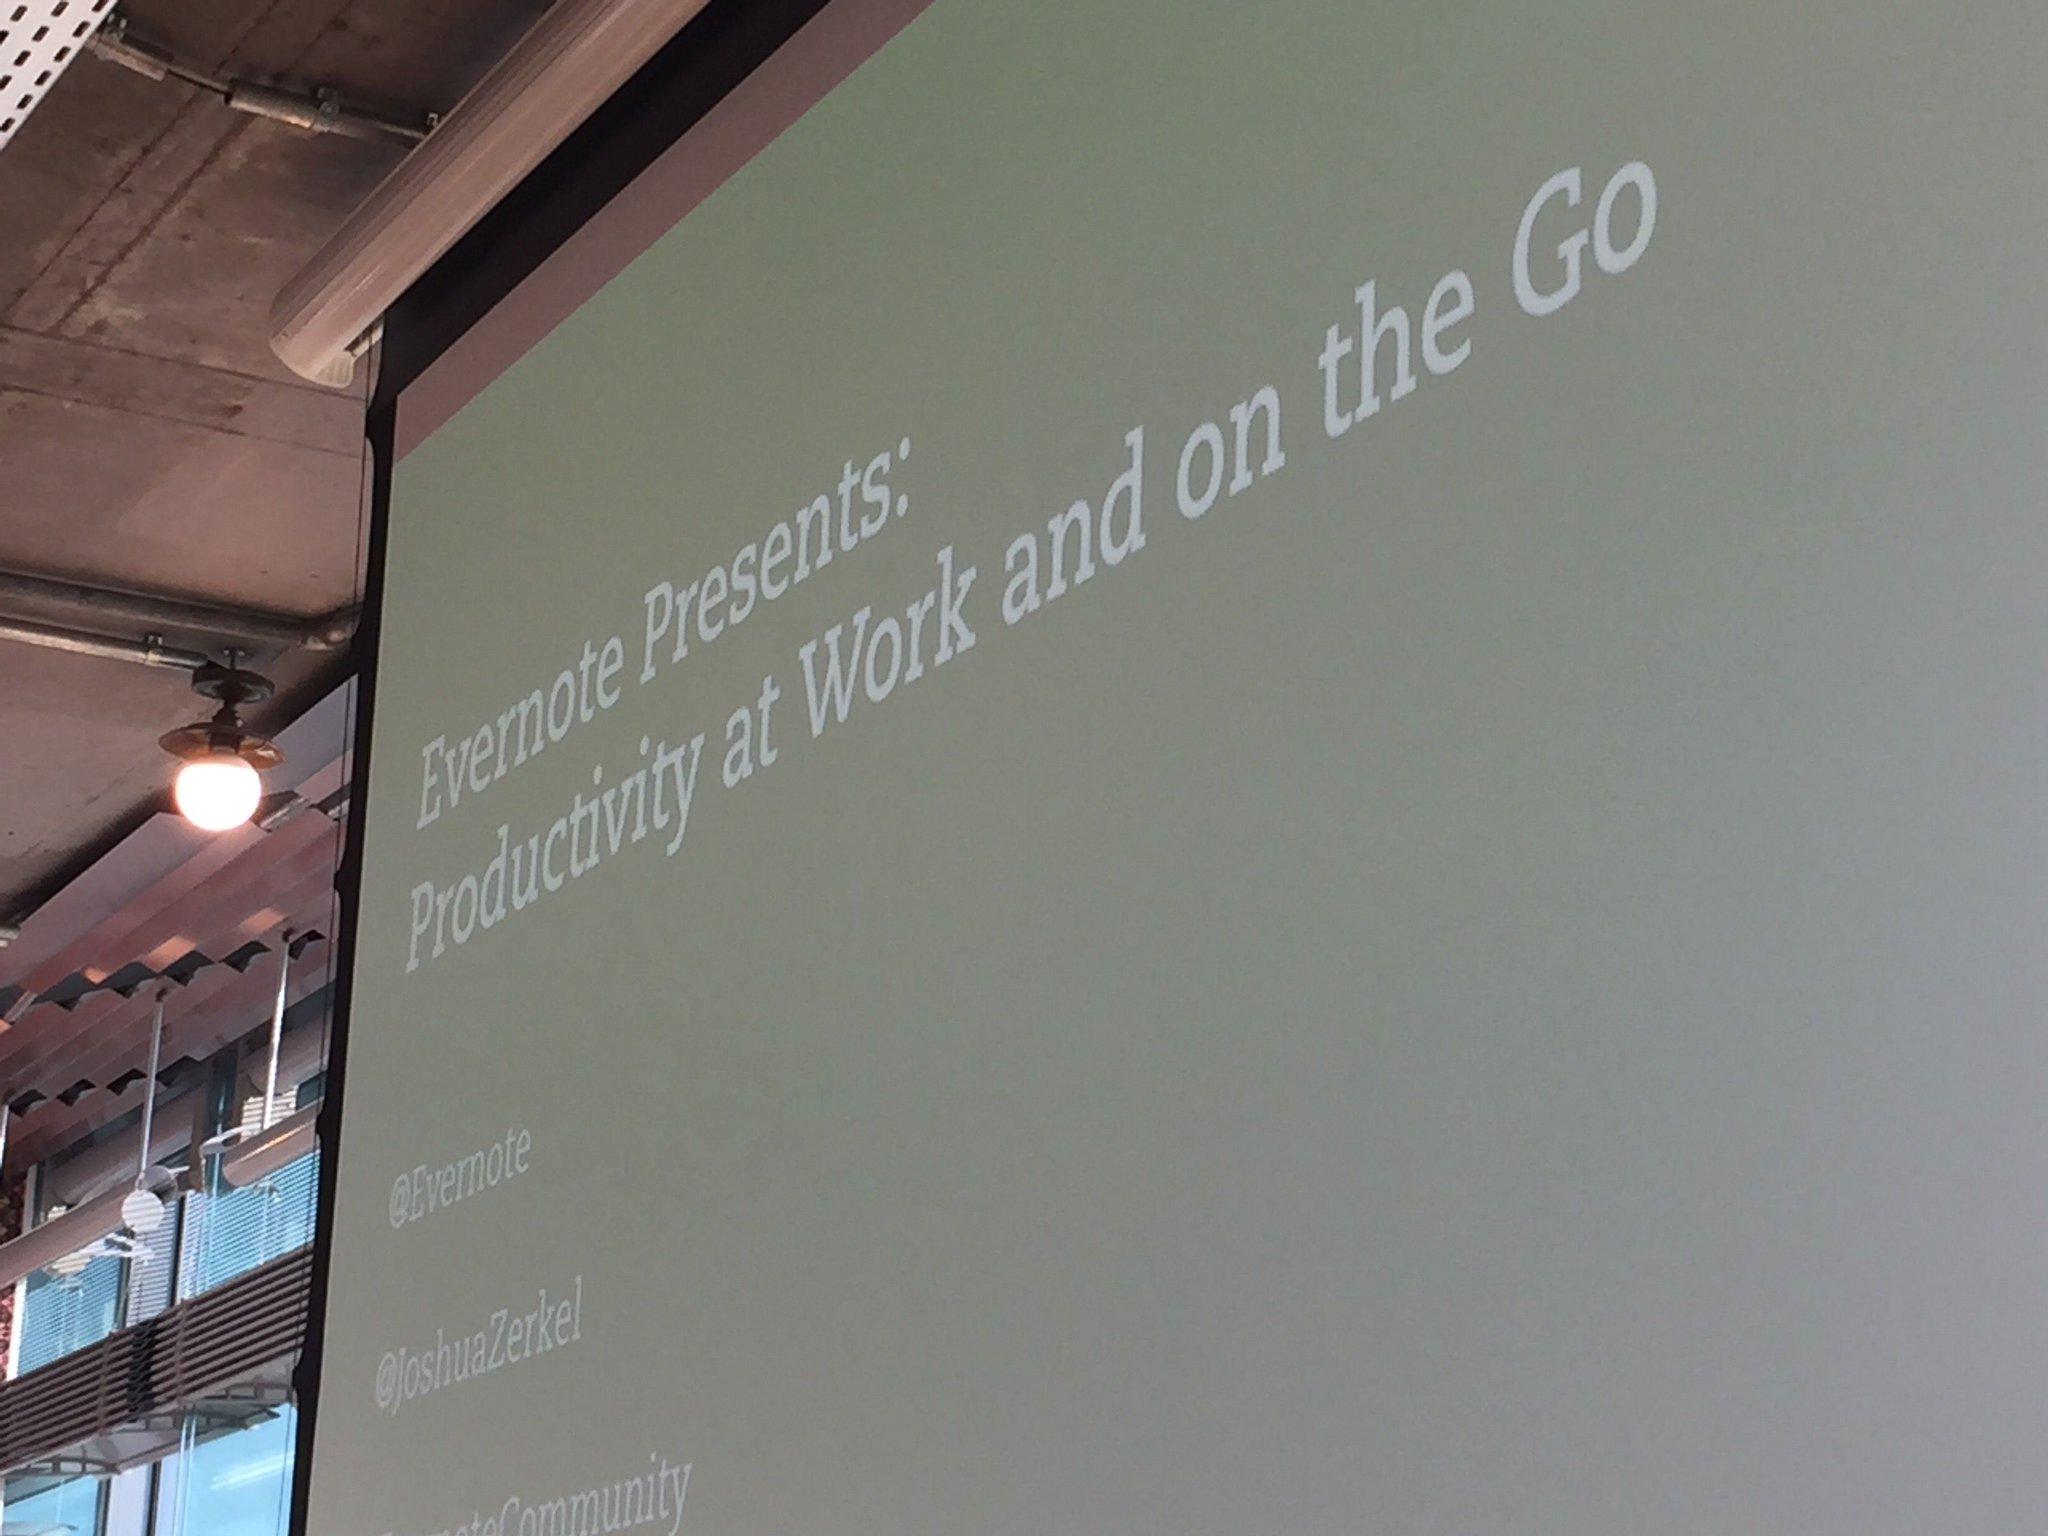 Great @evernote event in #Berlin yesterday Thx @joshuazerkel #EvernoteCommunity https://t.co/M9SGtX8OaT